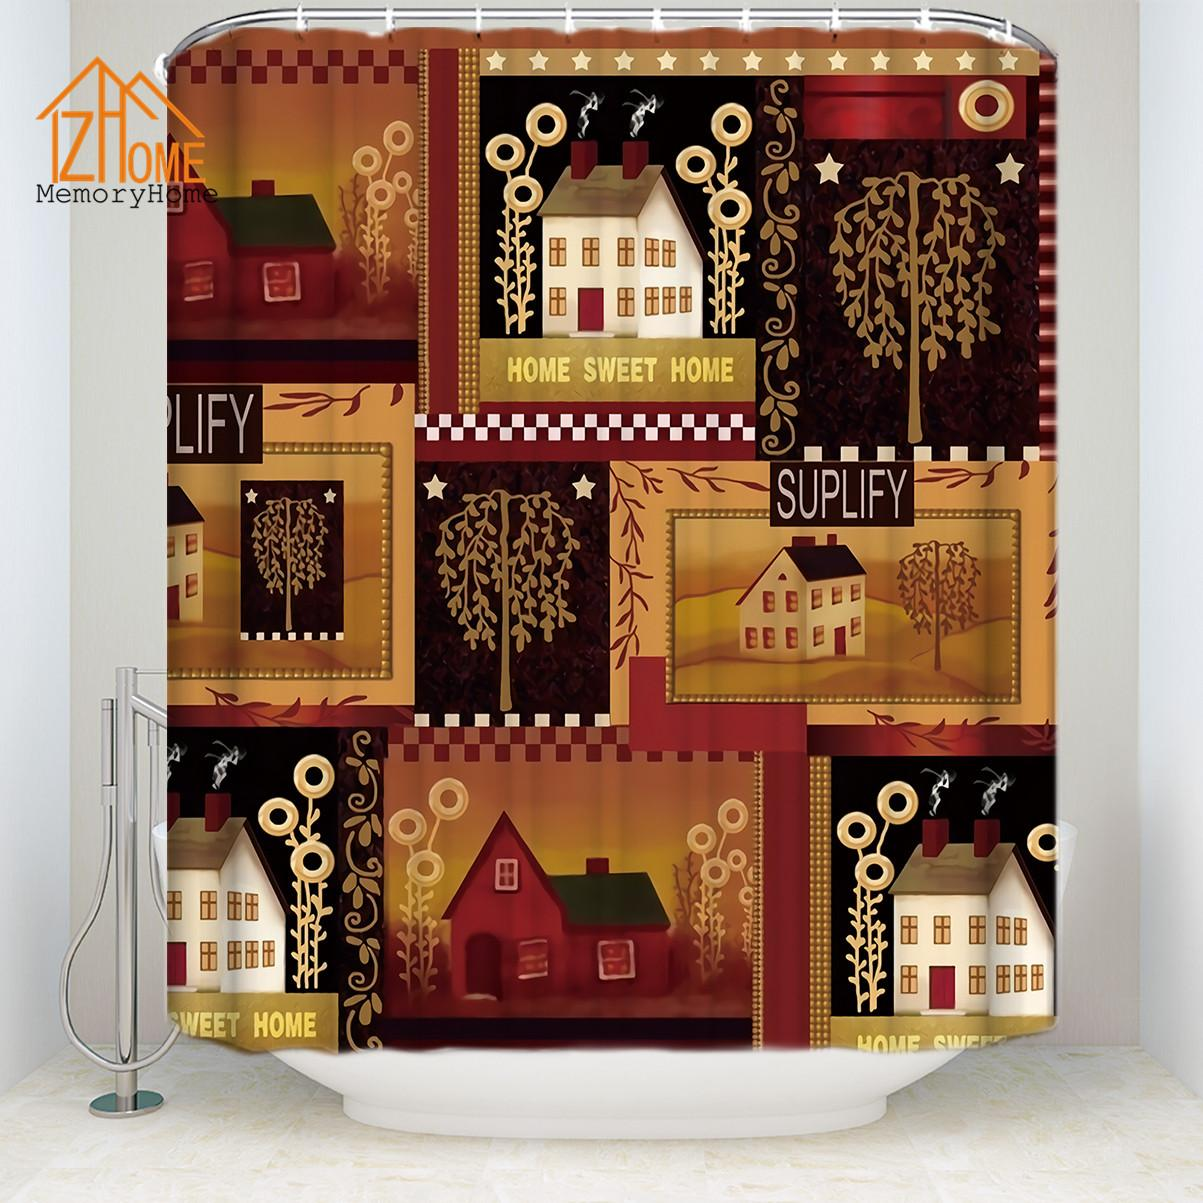 Memory Home Country Shower Curtain Bathroom Decor Home Sweet